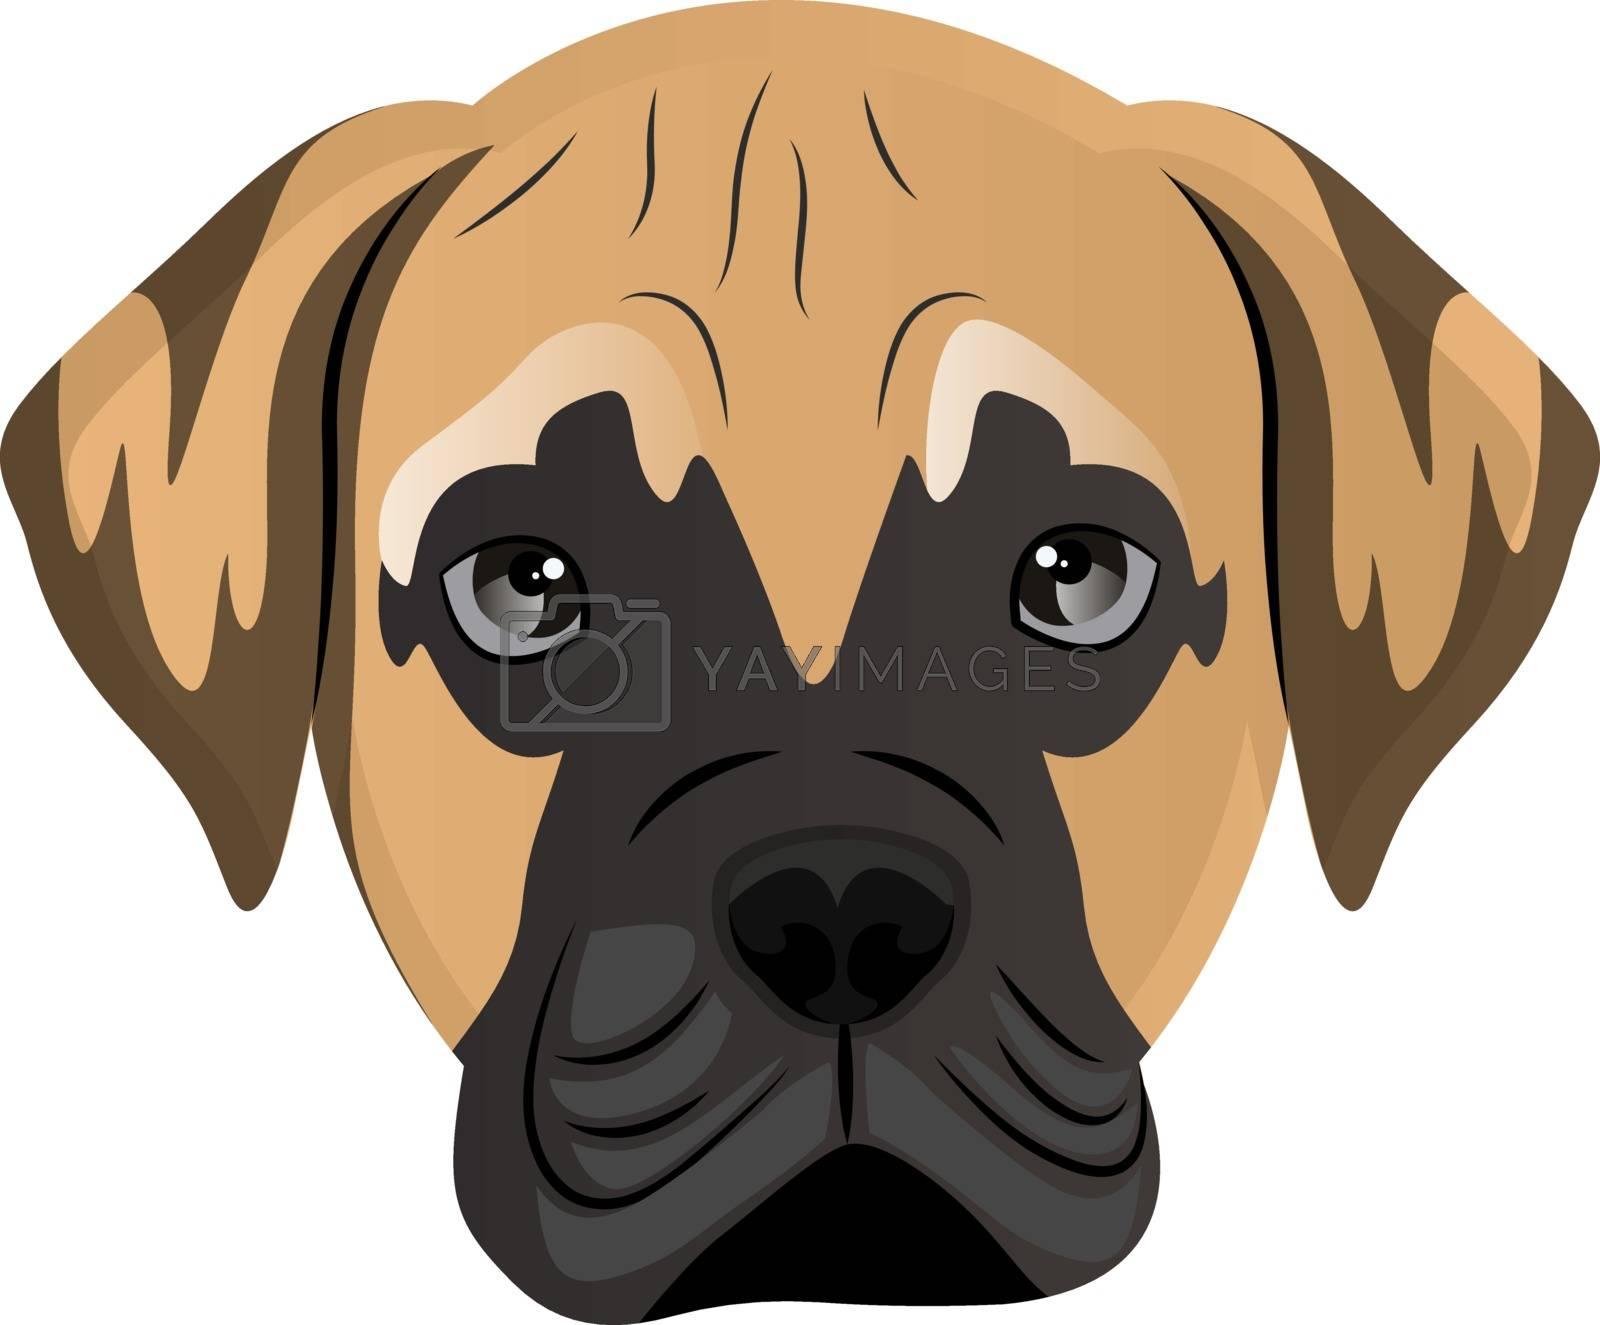 Royalty free image of Mastiff illustration vector on white background by Morphart